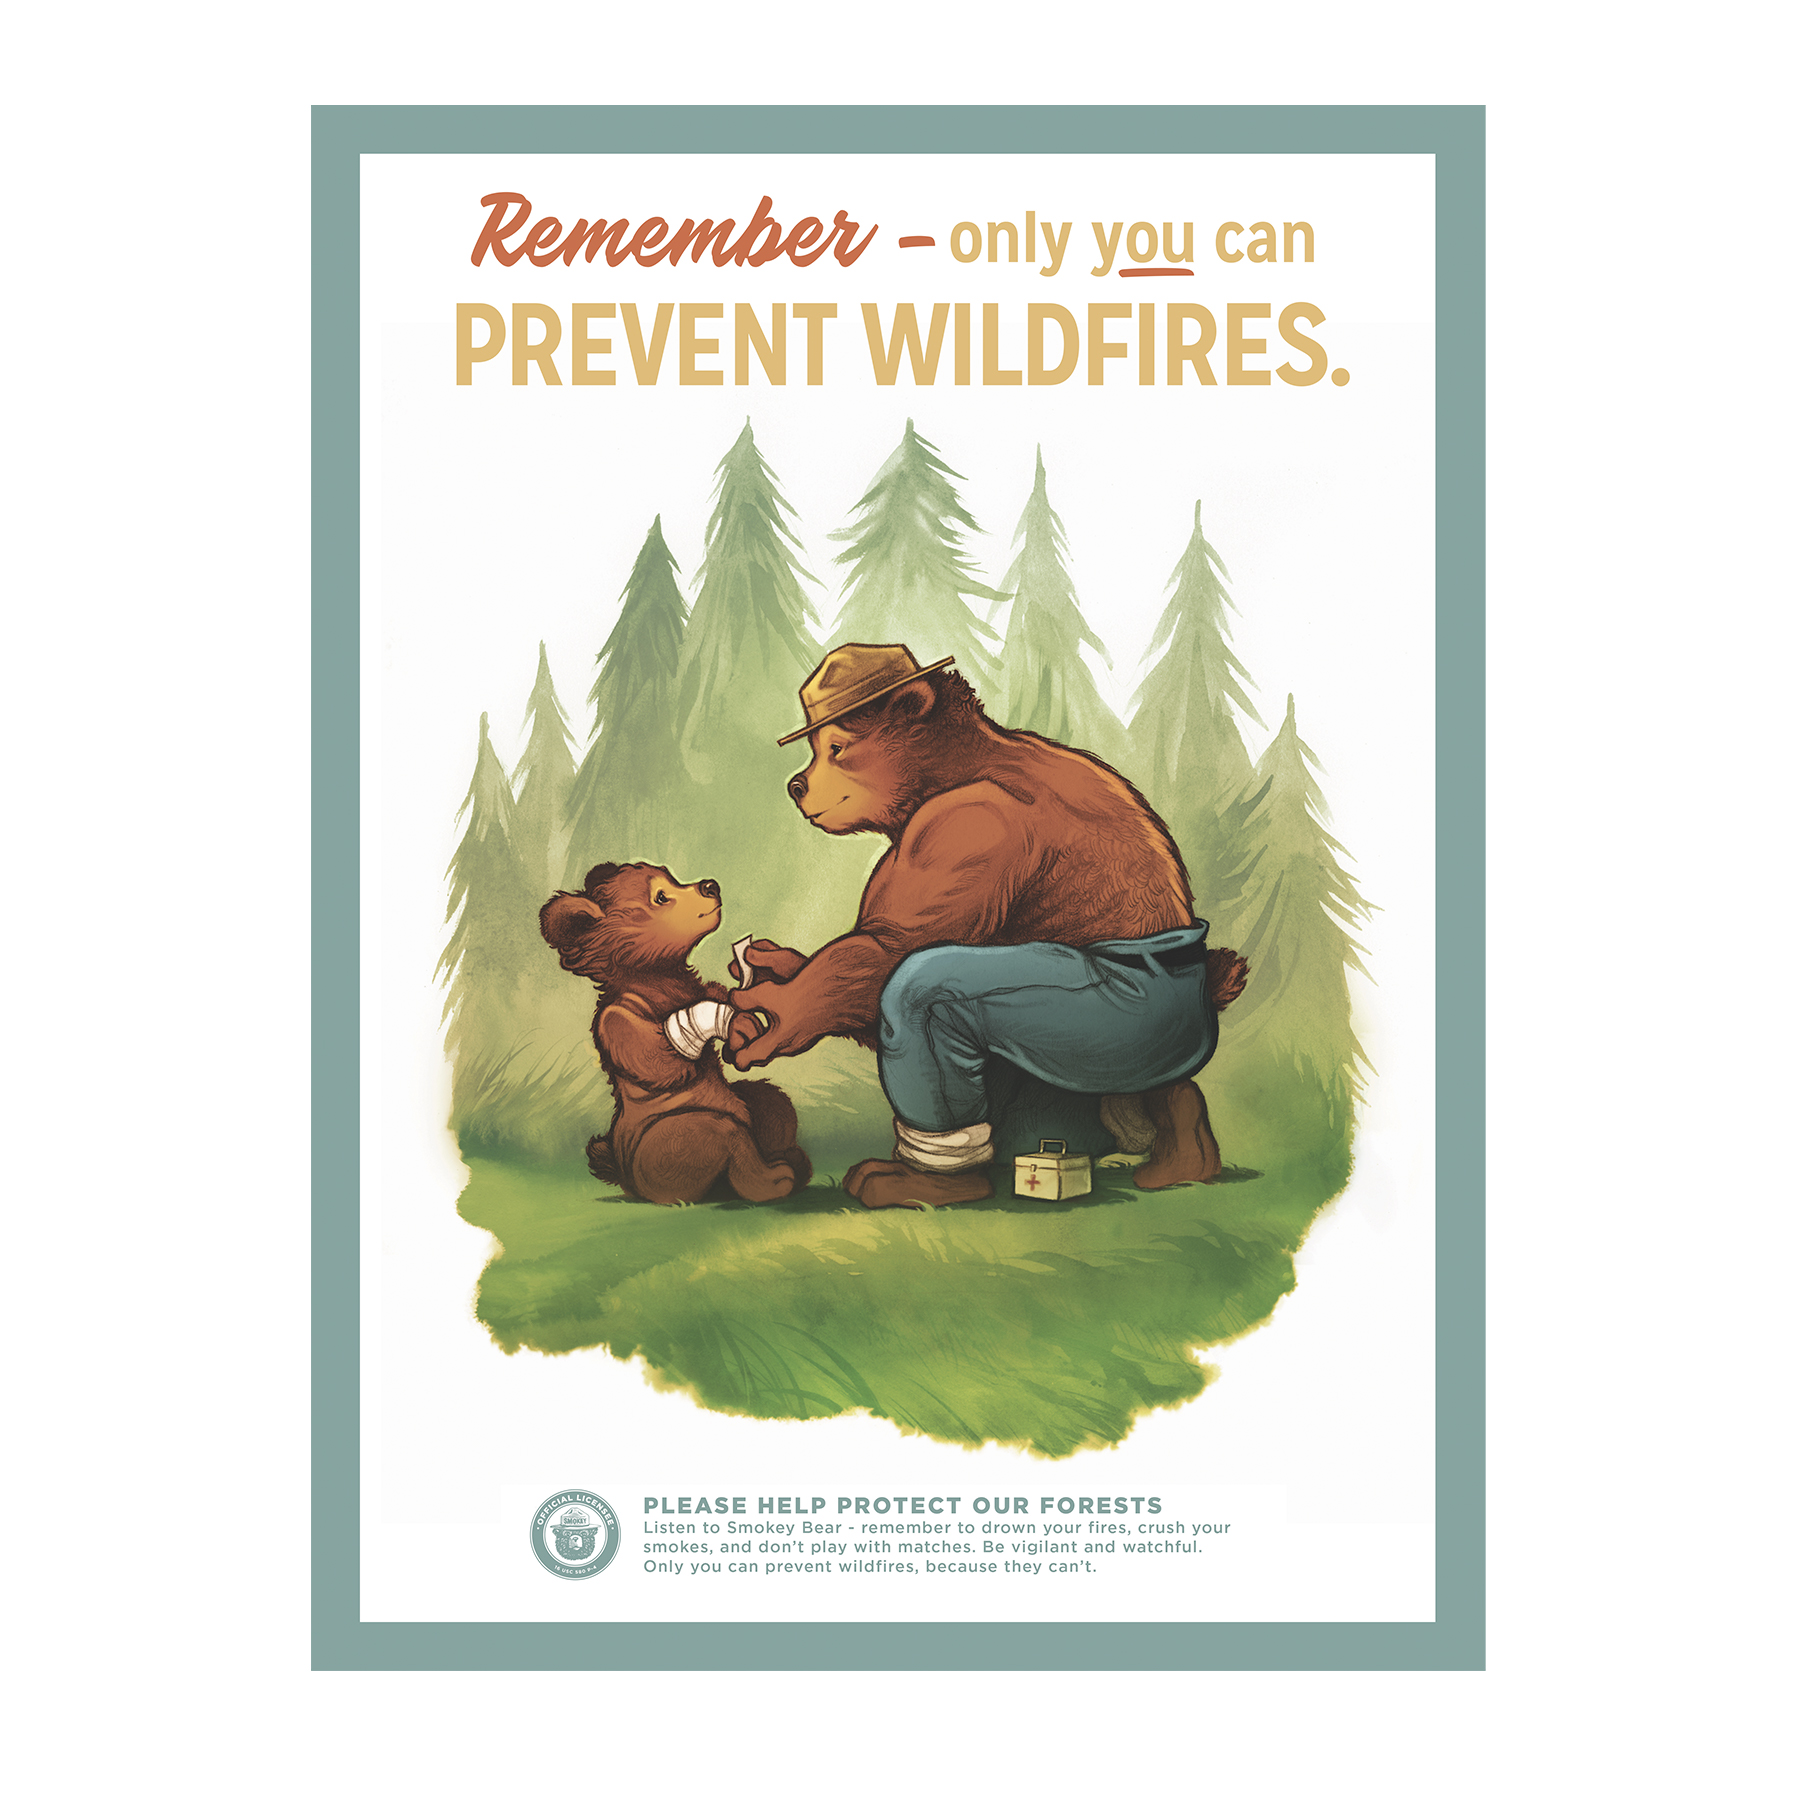 prevent-wildfires-poster.jpg